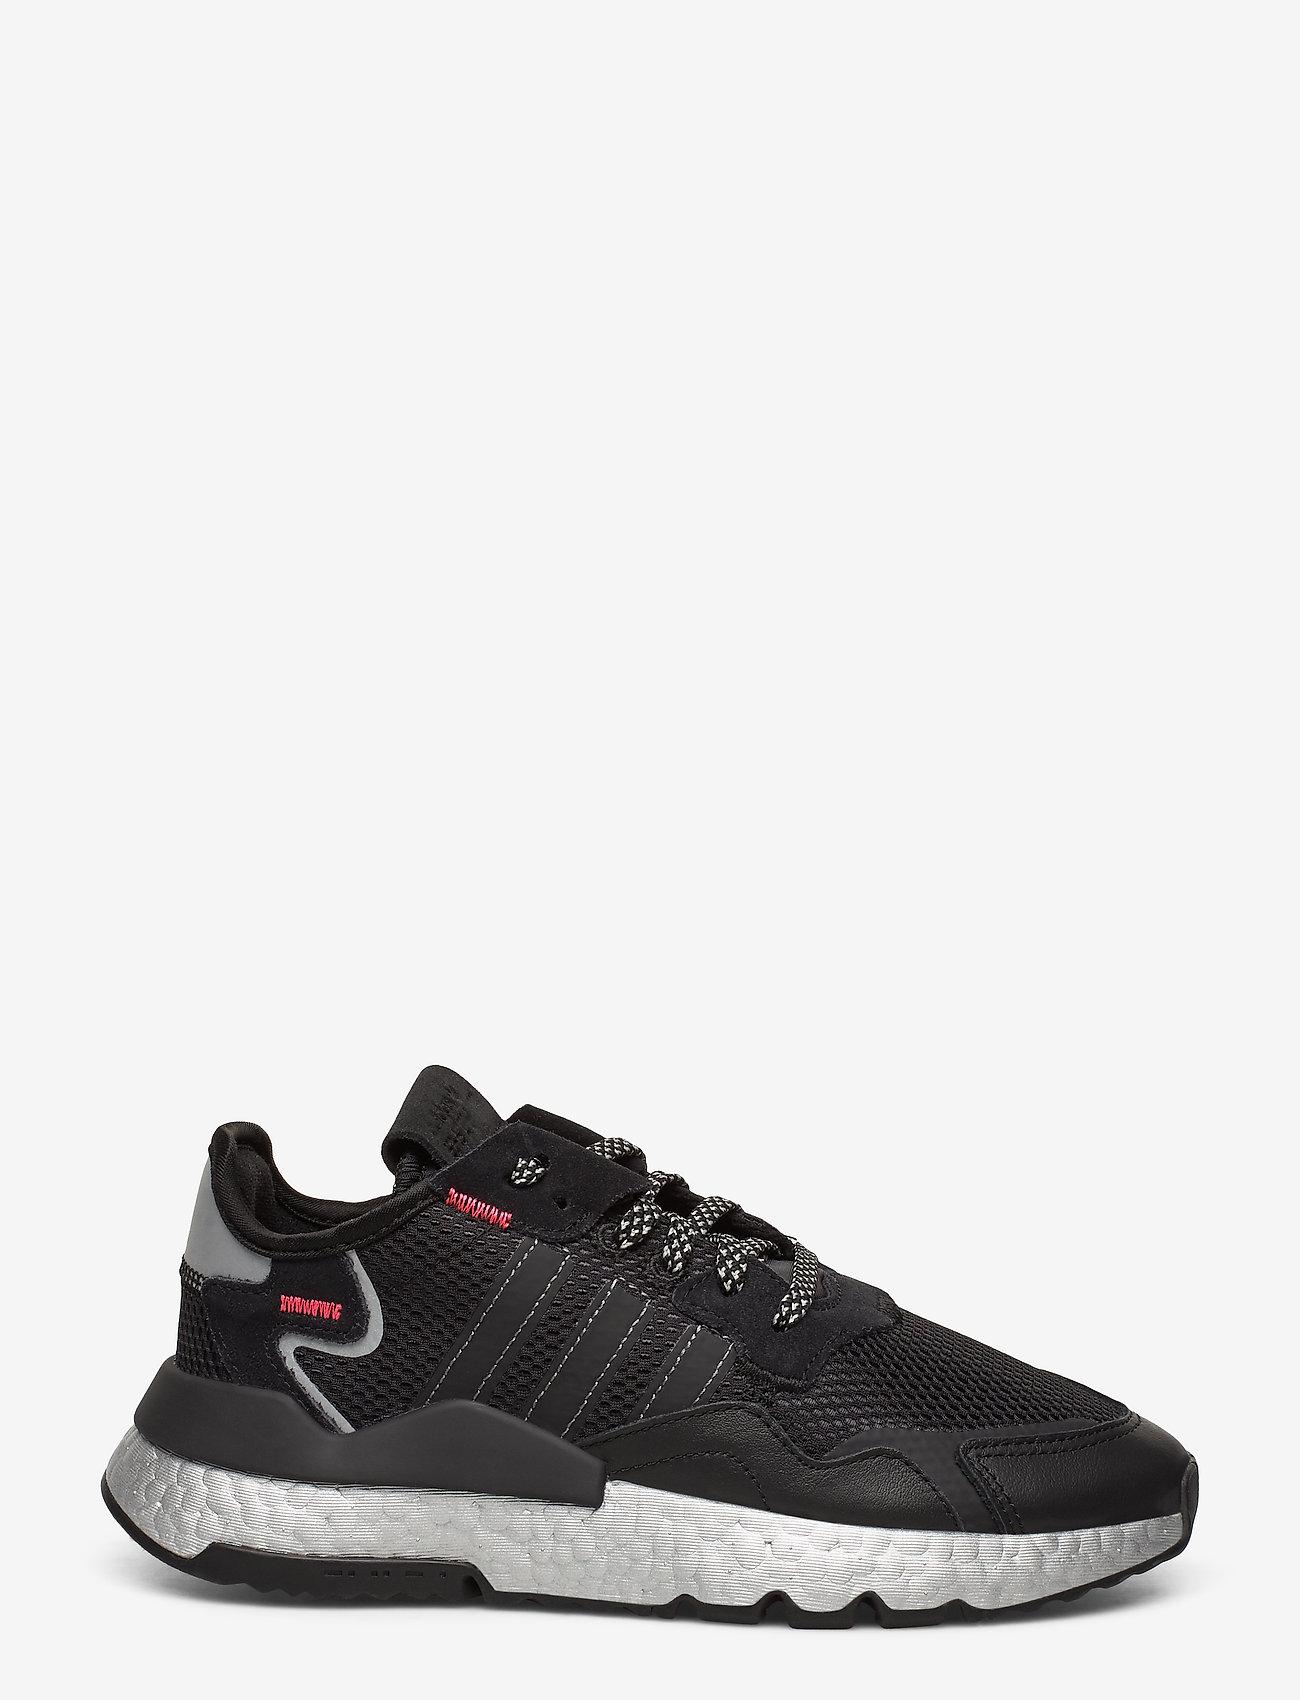 Nite Jogger W (Cblack/shored/silvmt) - adidas Originals uOeIuE